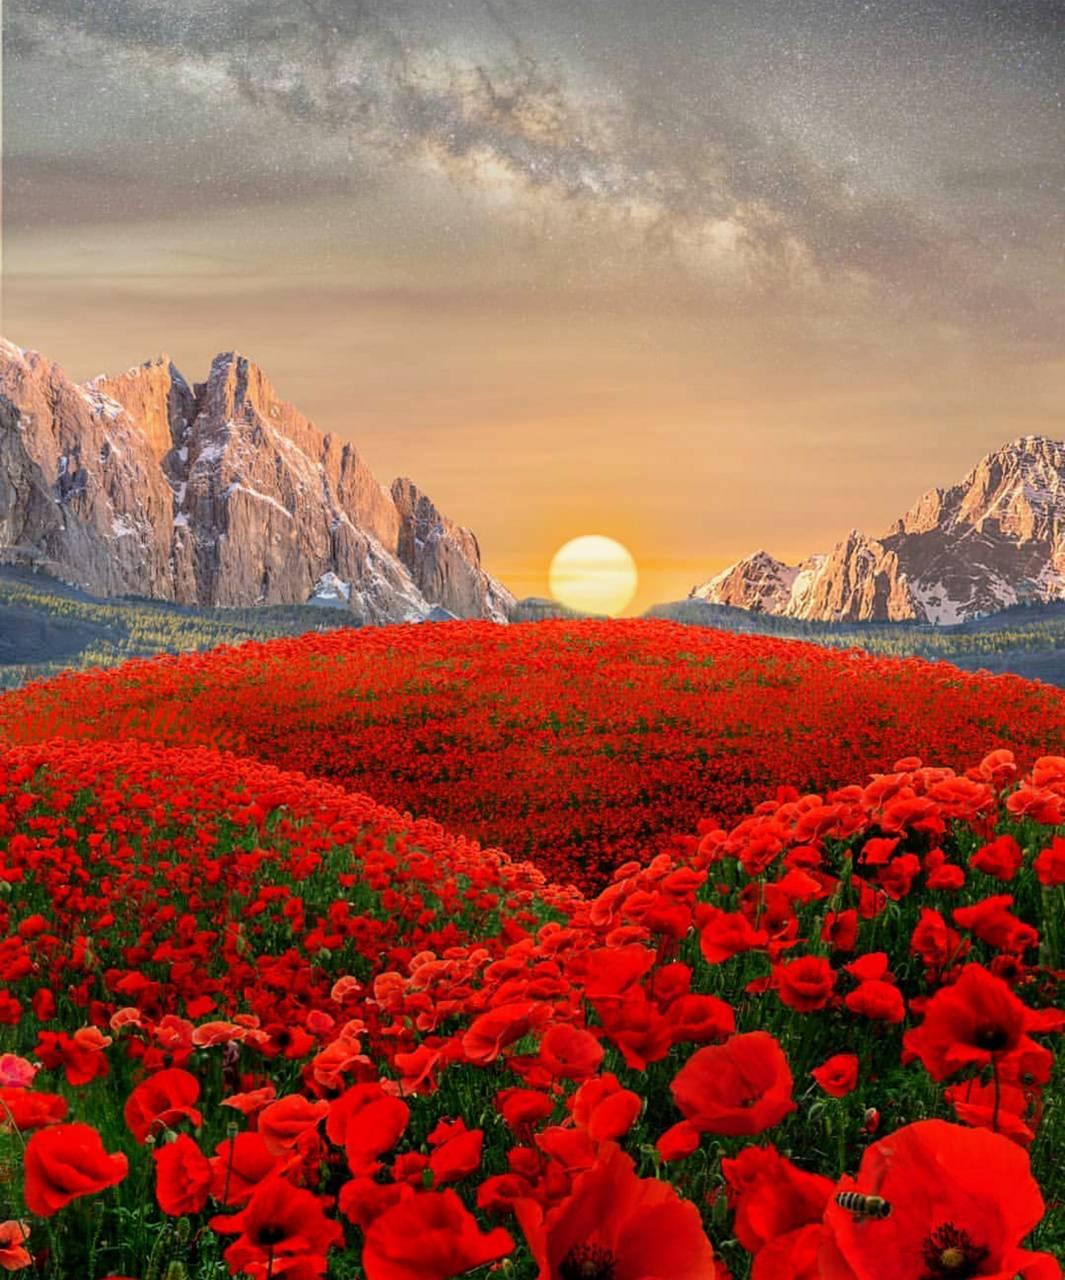 Flowery mountain